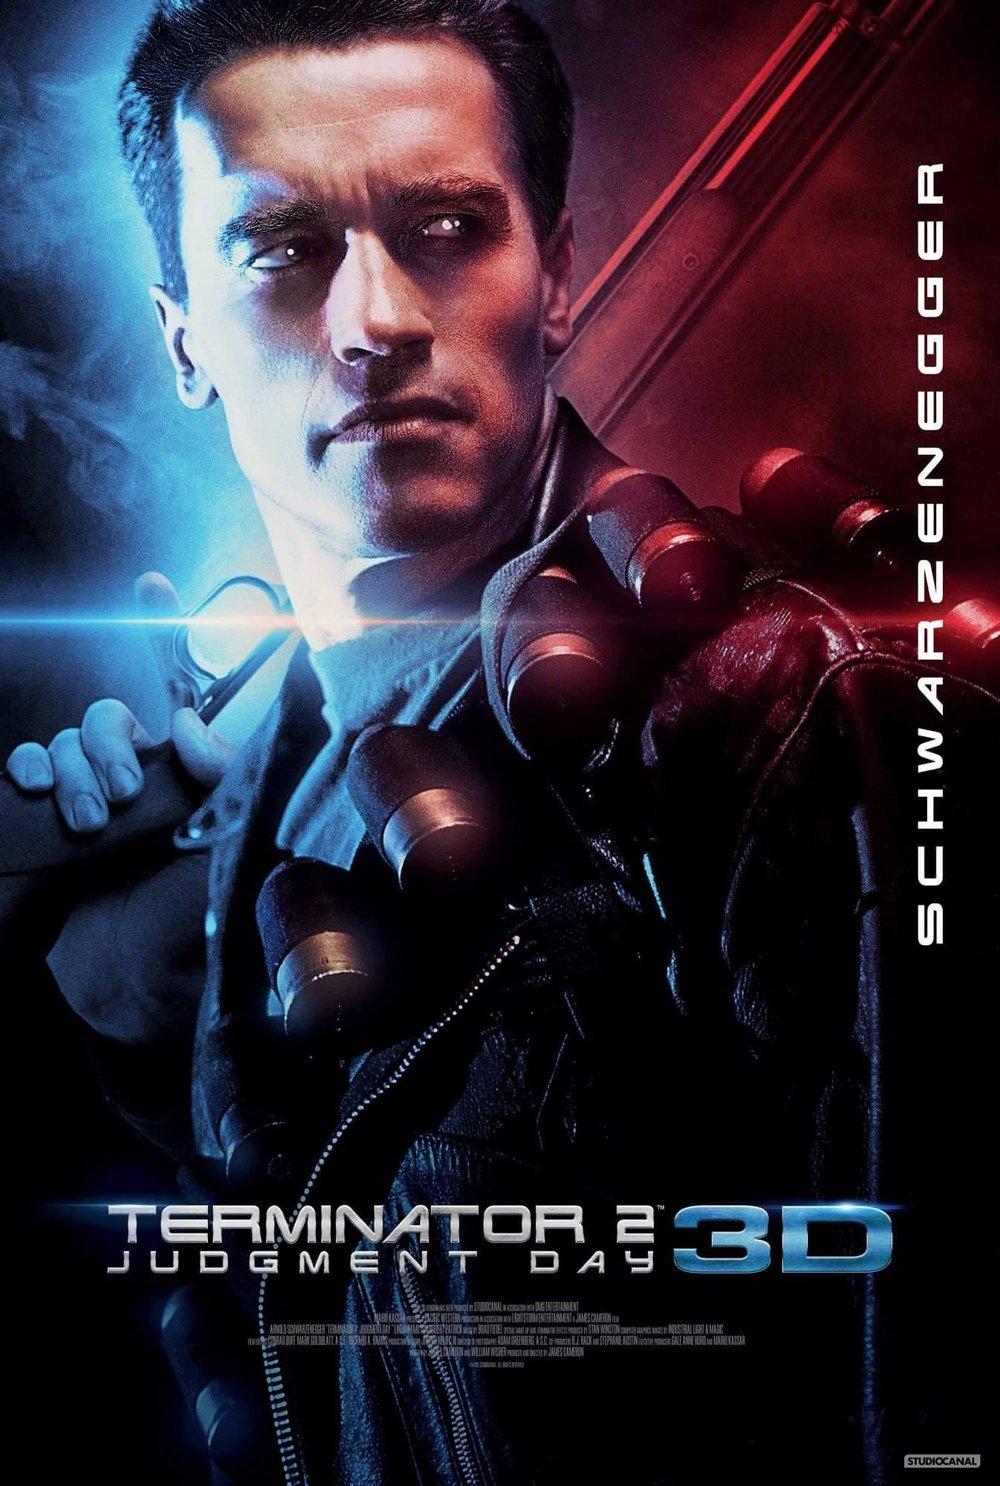 terminator2-3d.jpg